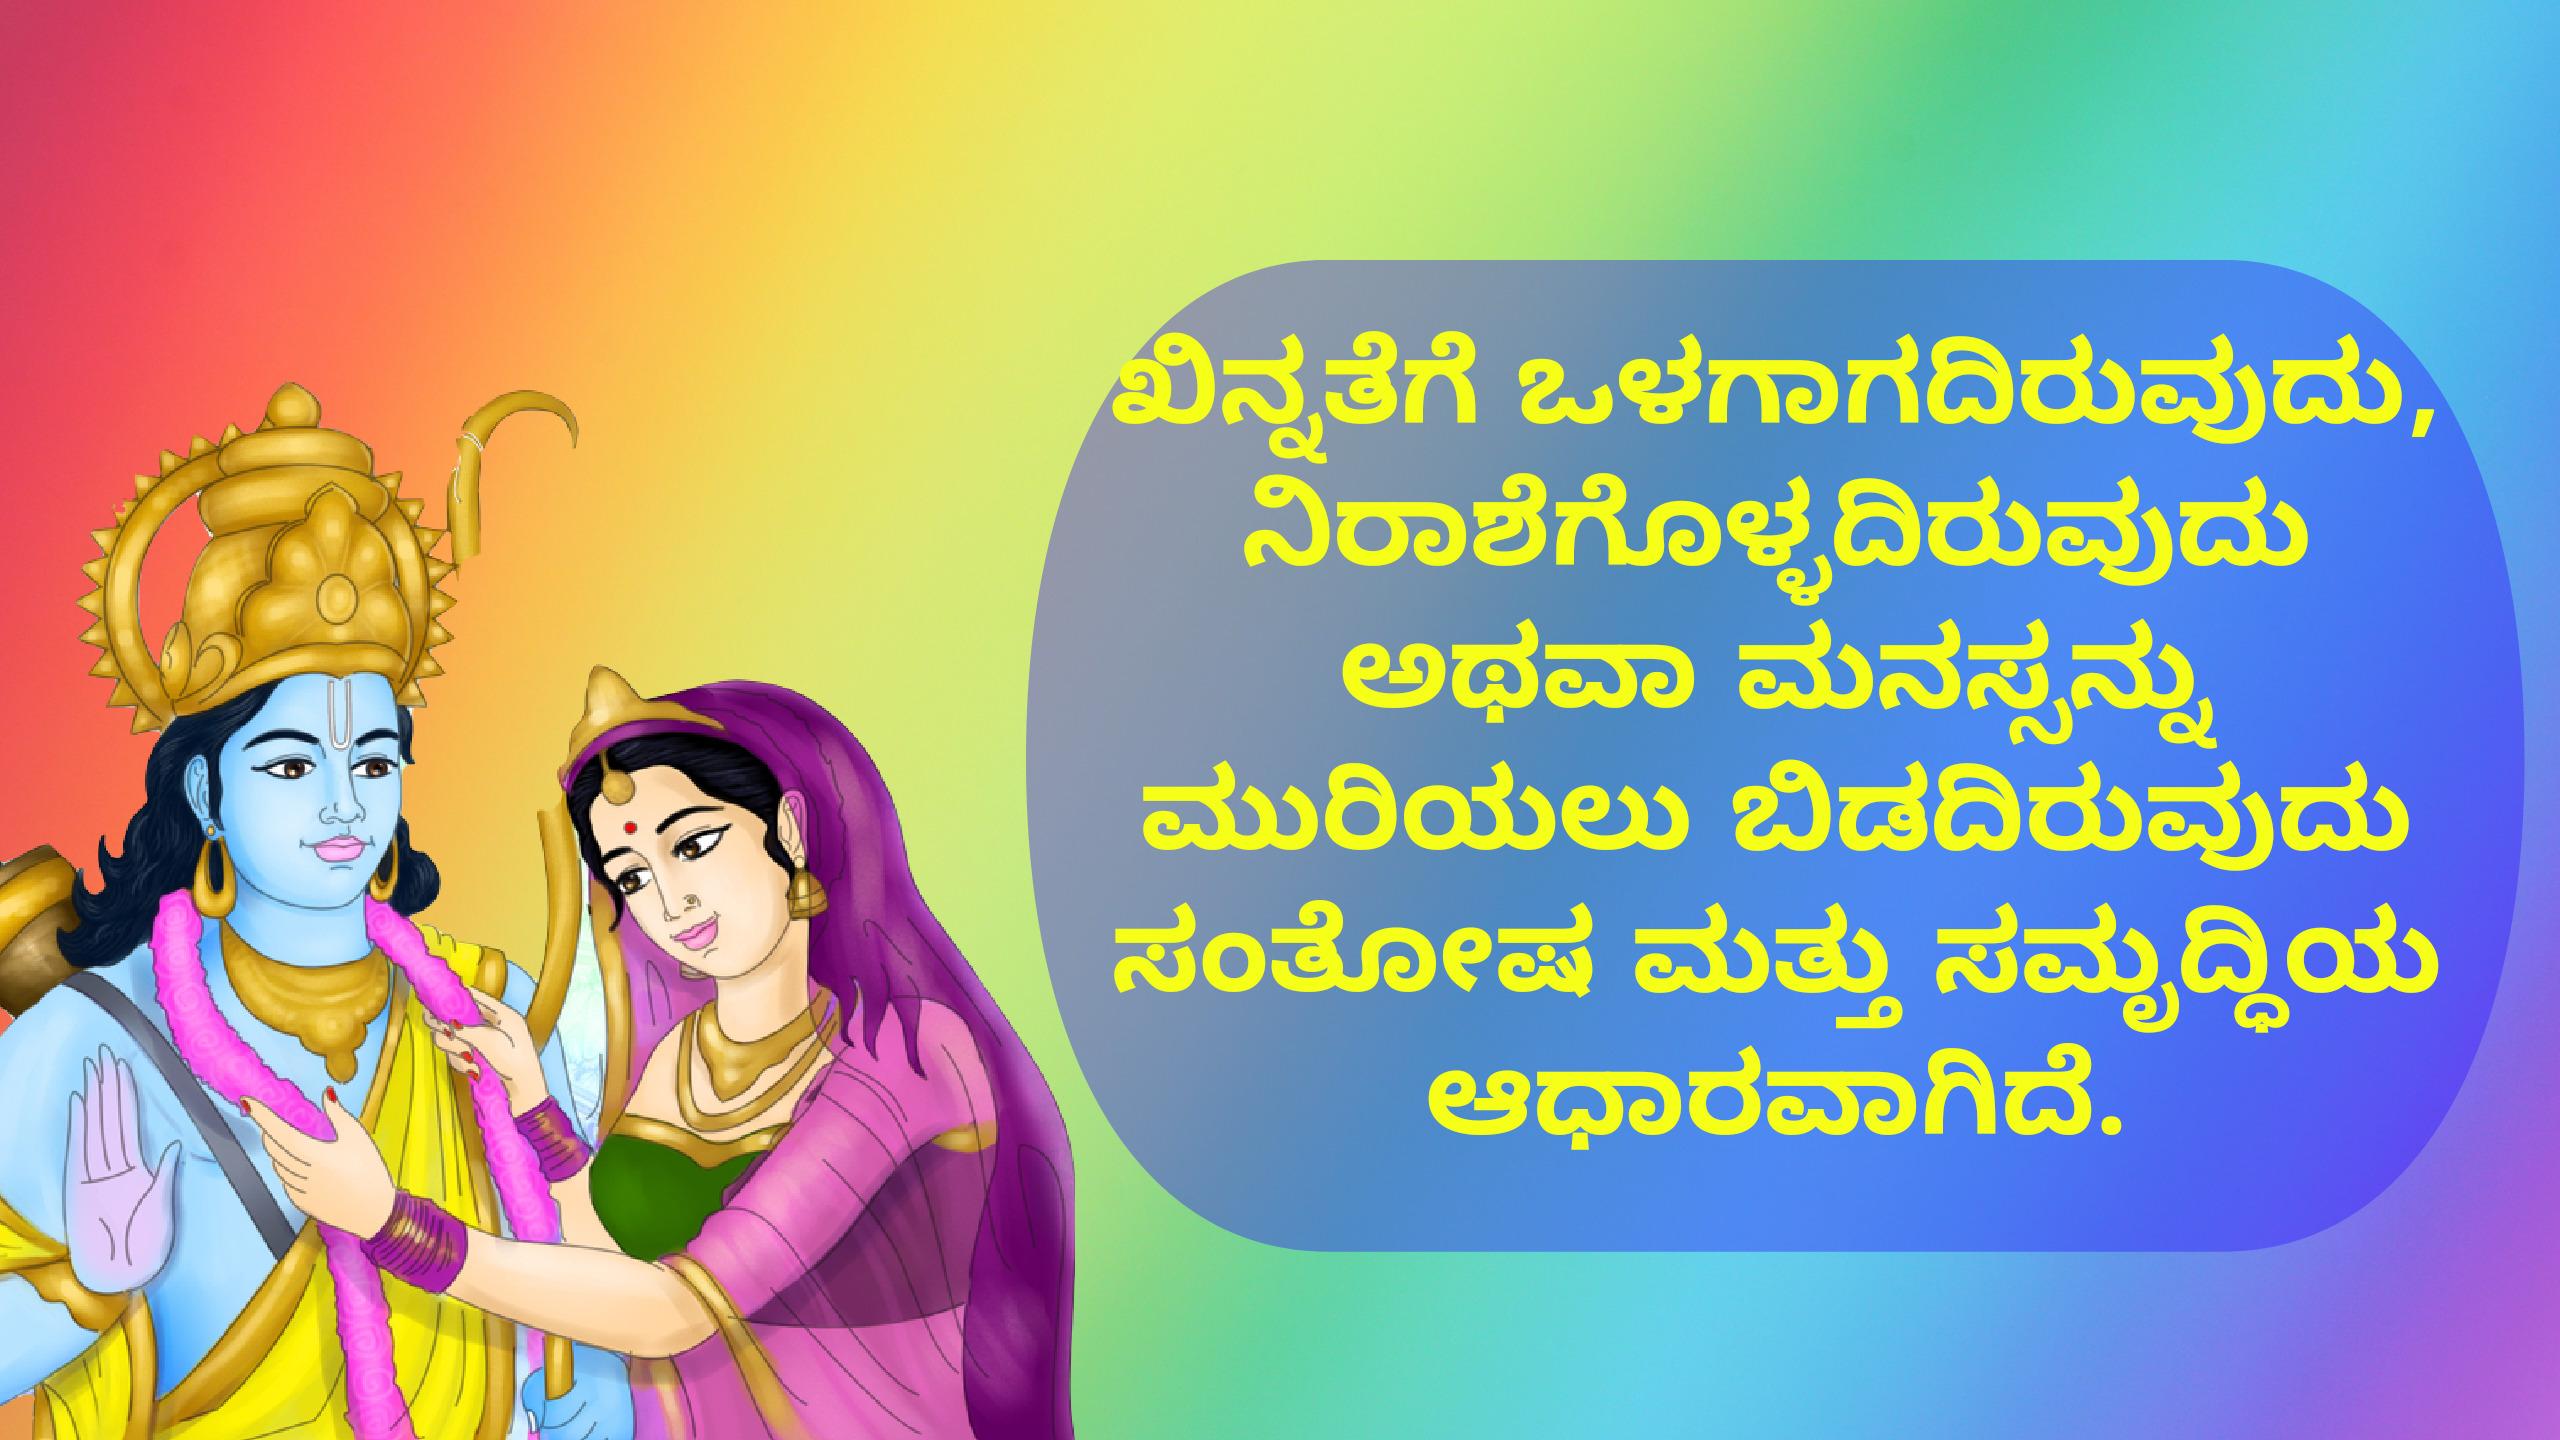 1. Shree Ram Quotes in Kannada